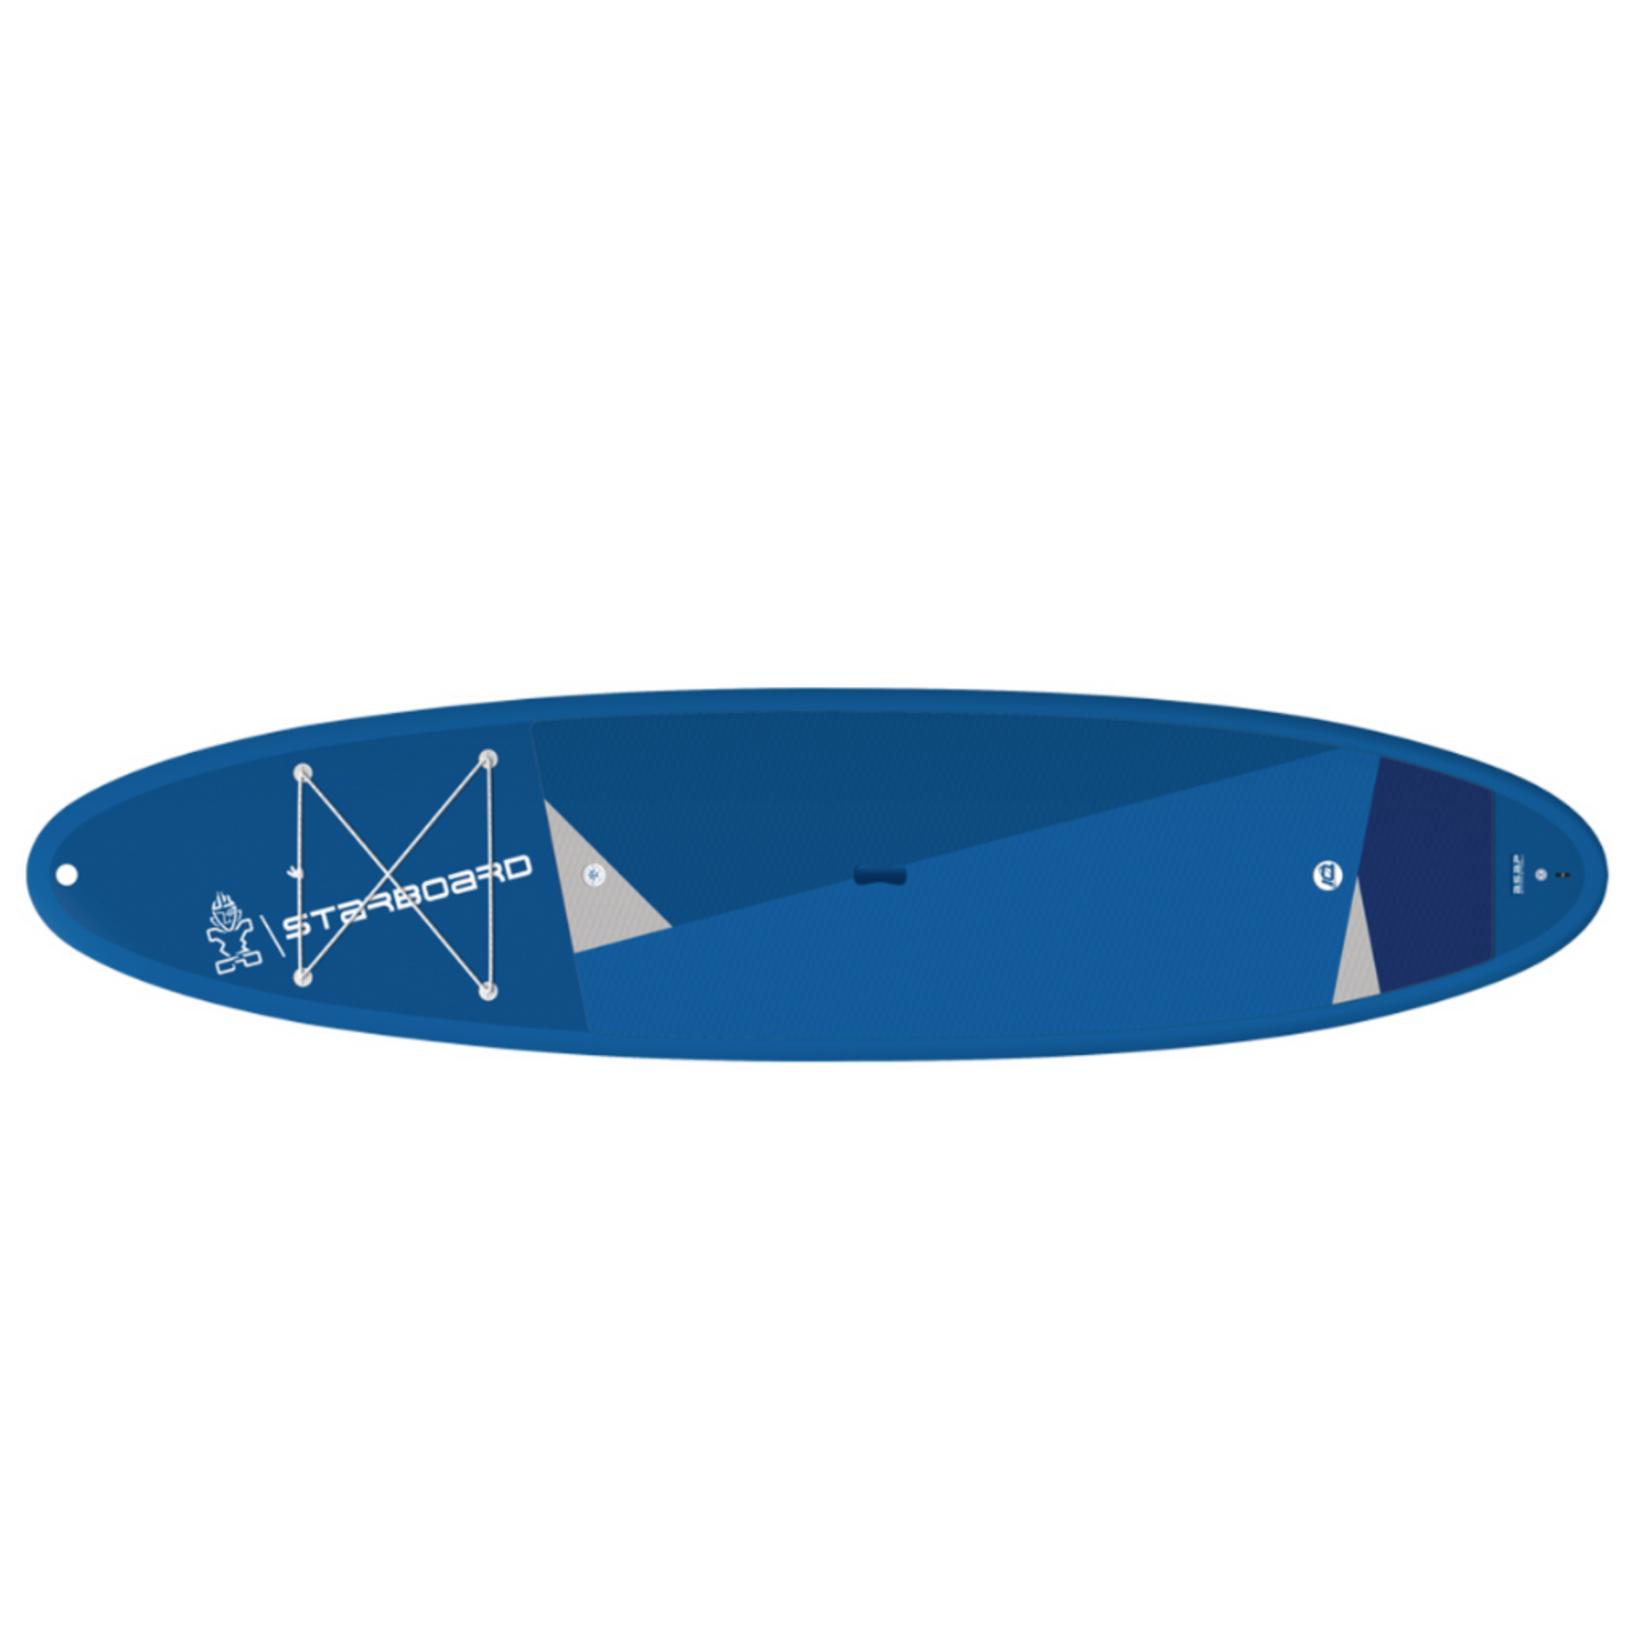 Starboard 10'8 x 31 Starboard GO ASAP